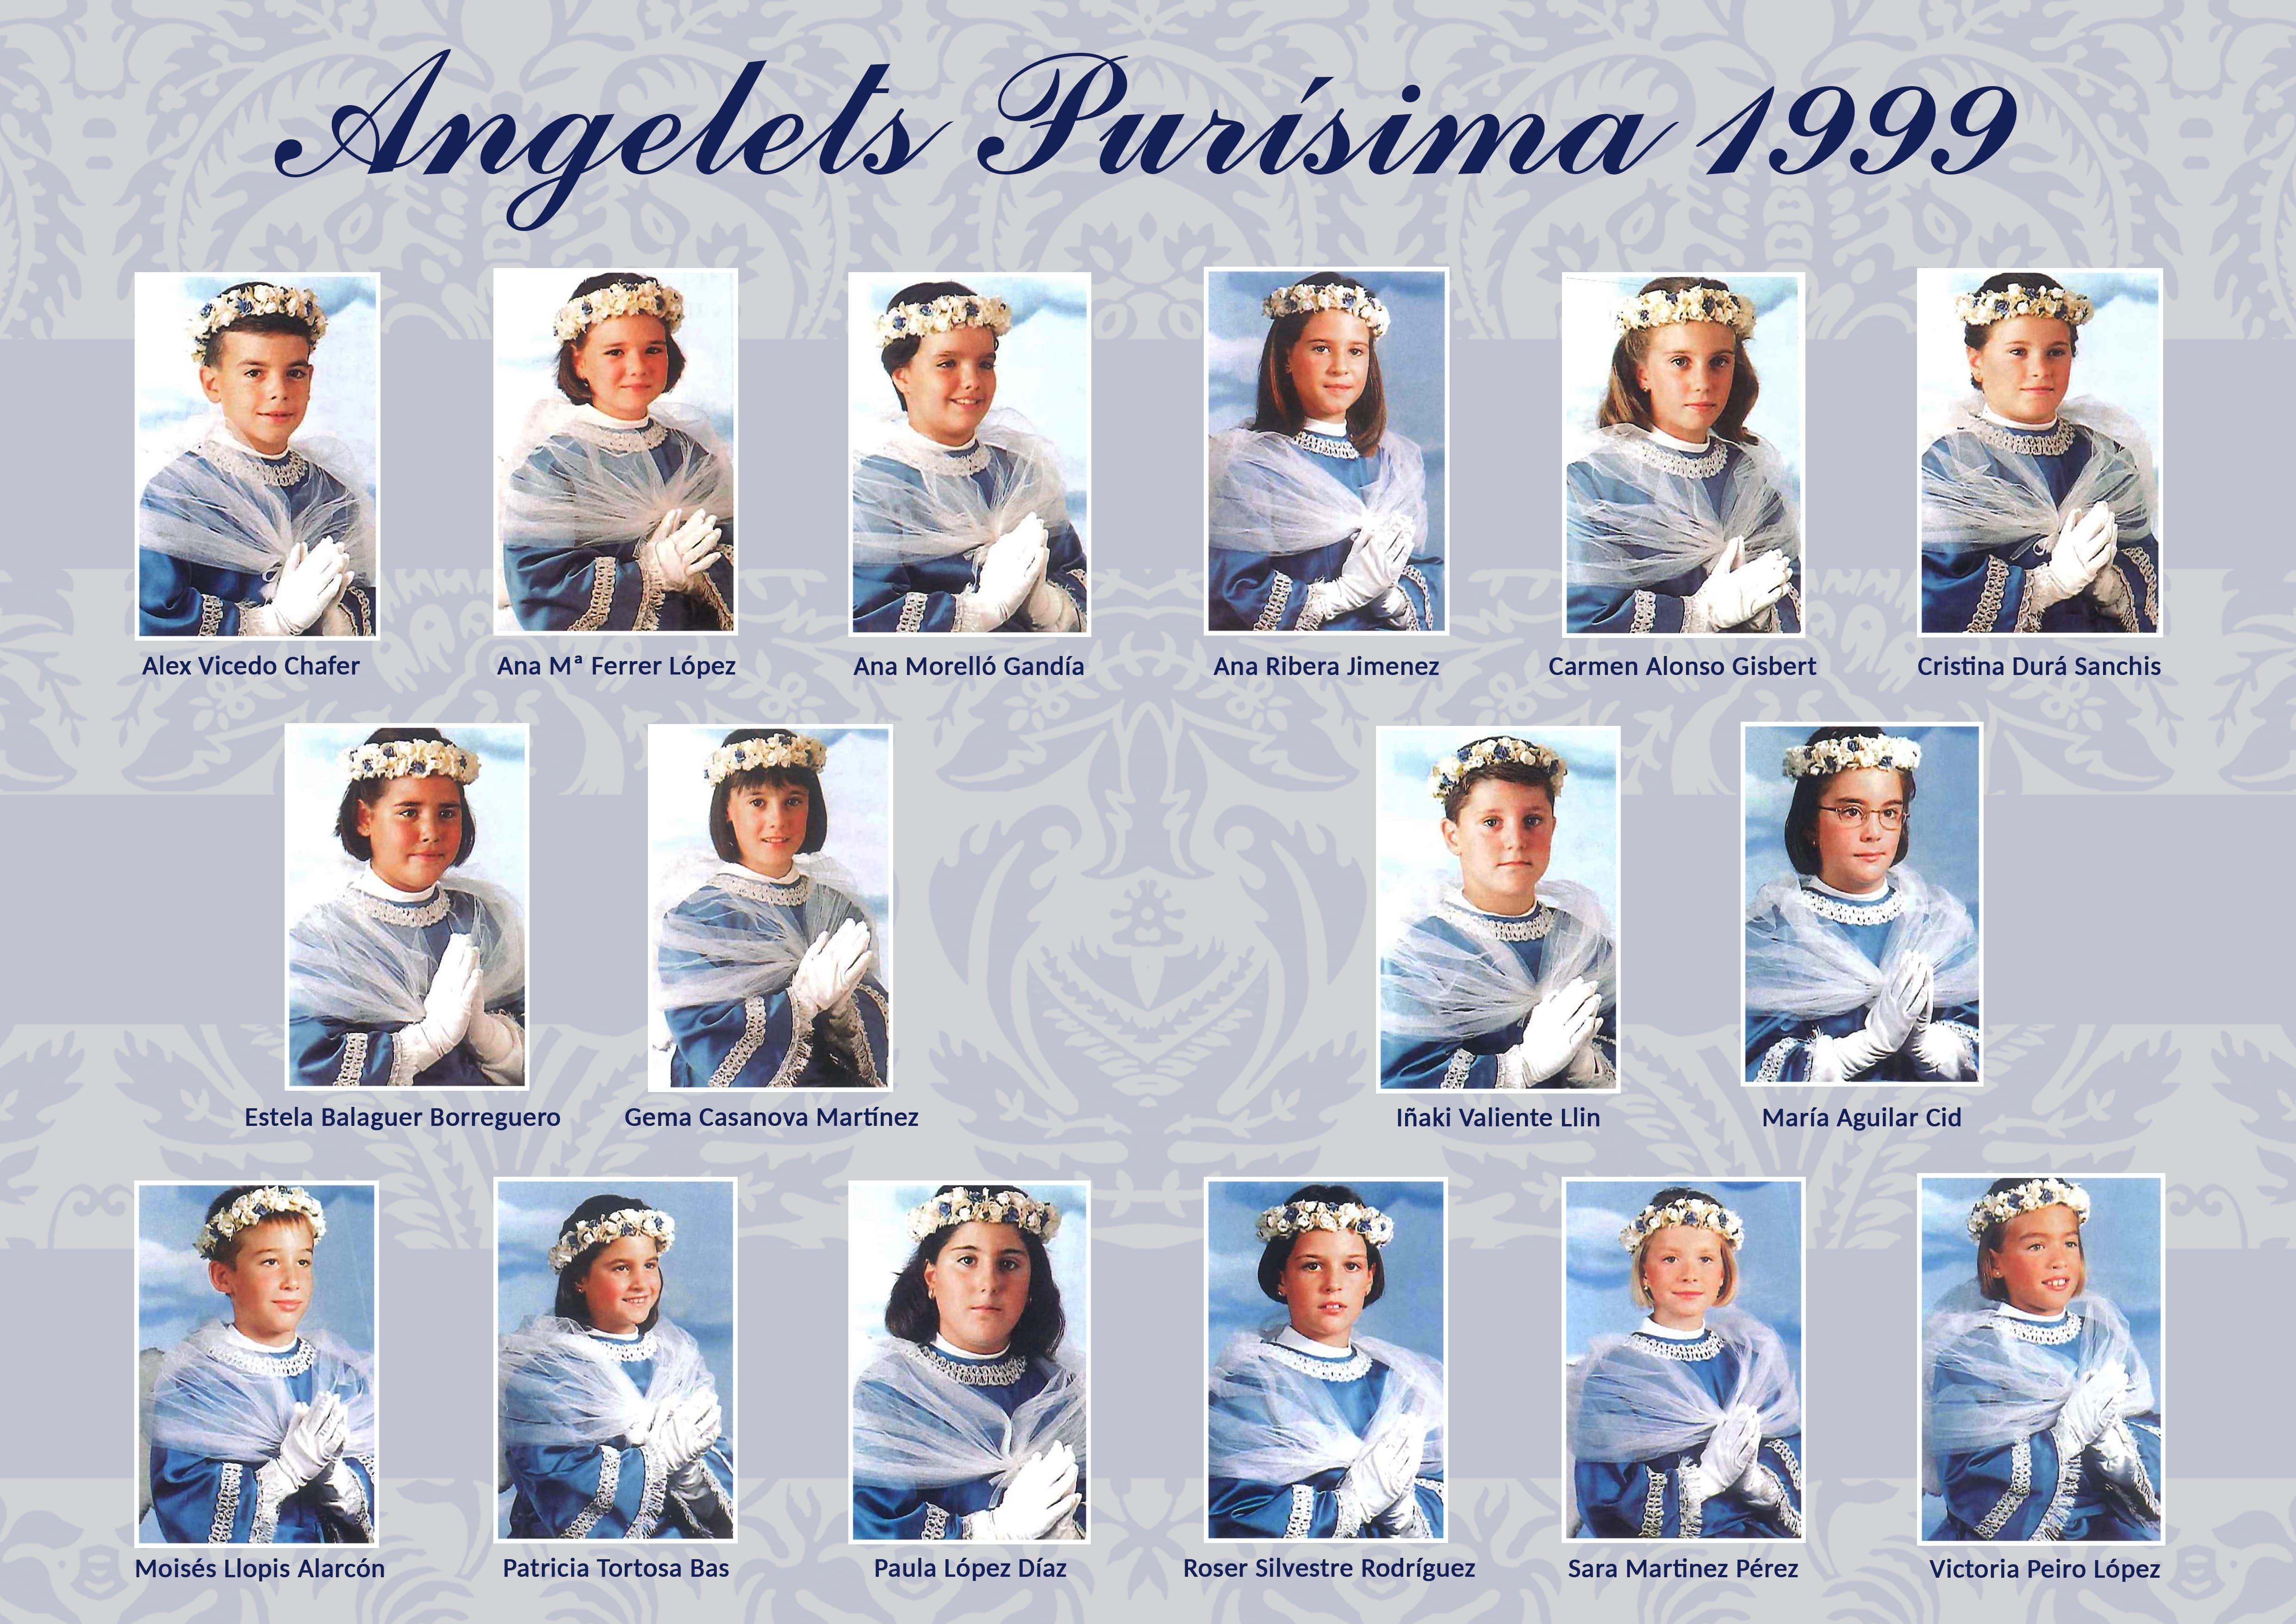 Angelets 1999